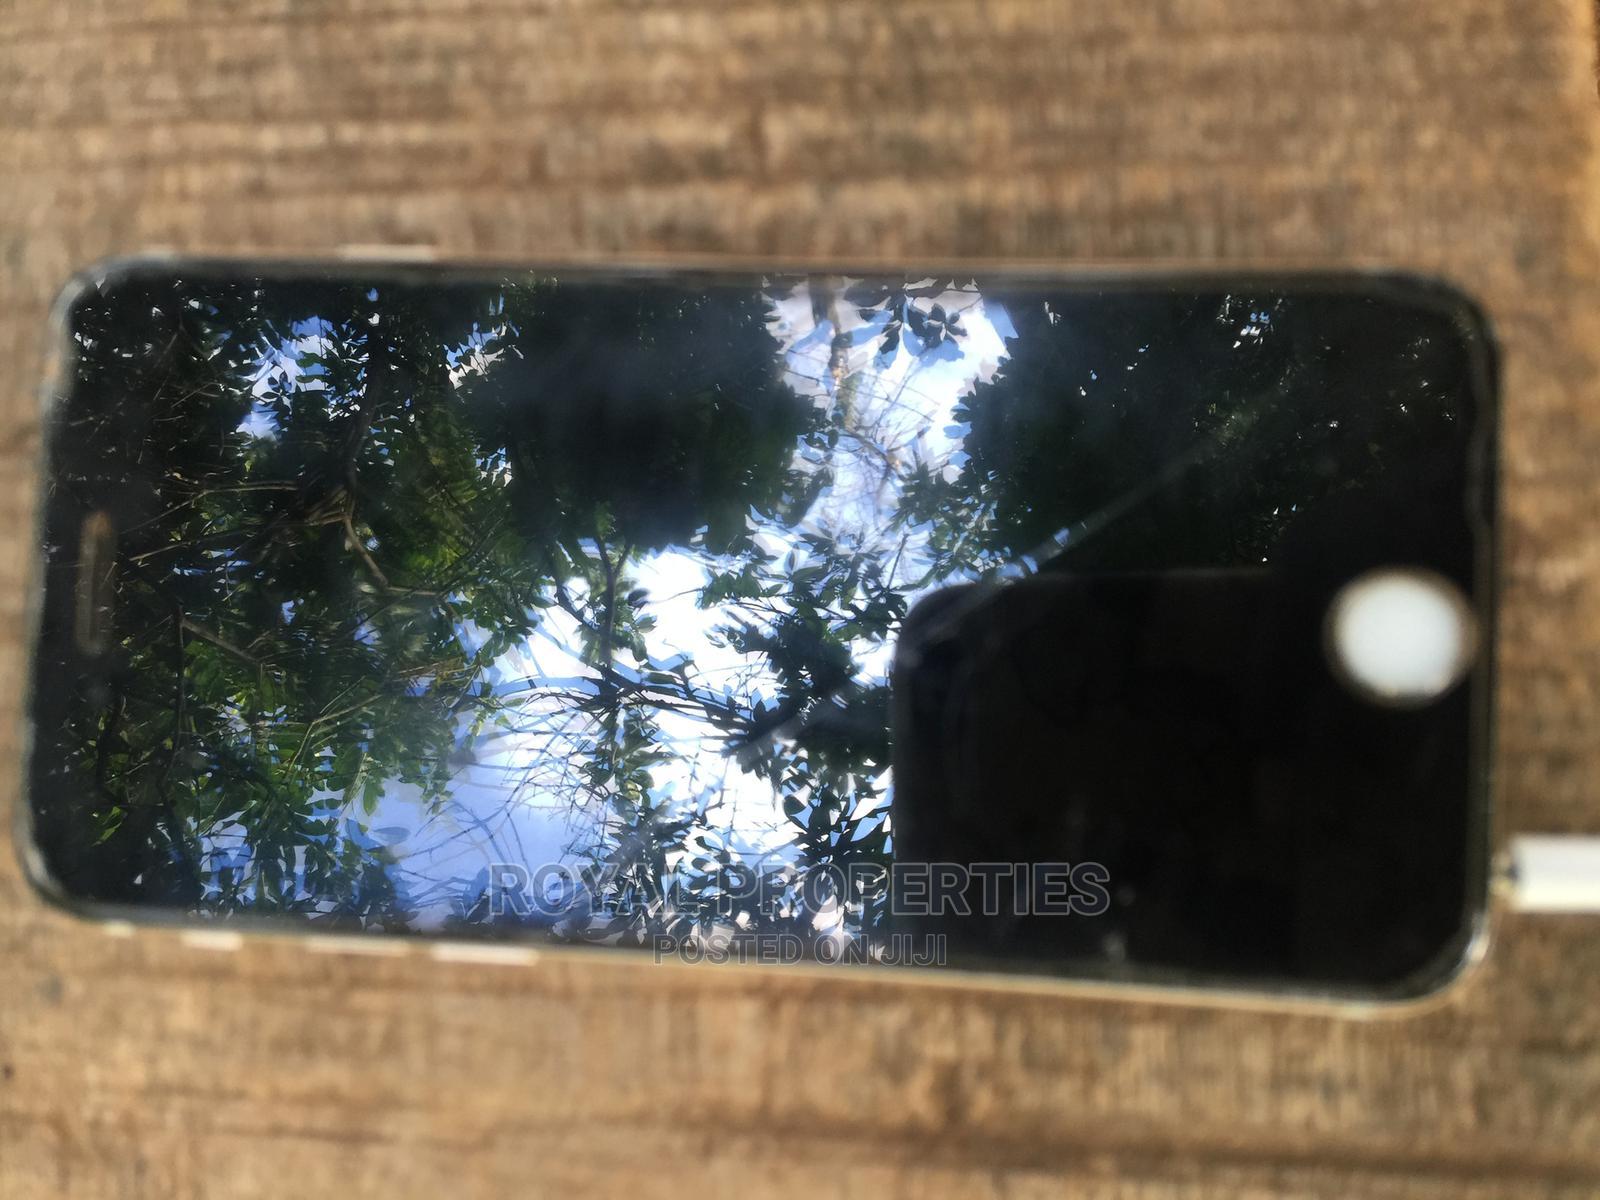 Apple iPhone 6 64 GB Gold | Mobile Phones for sale in Osogbo, Osun State, Nigeria